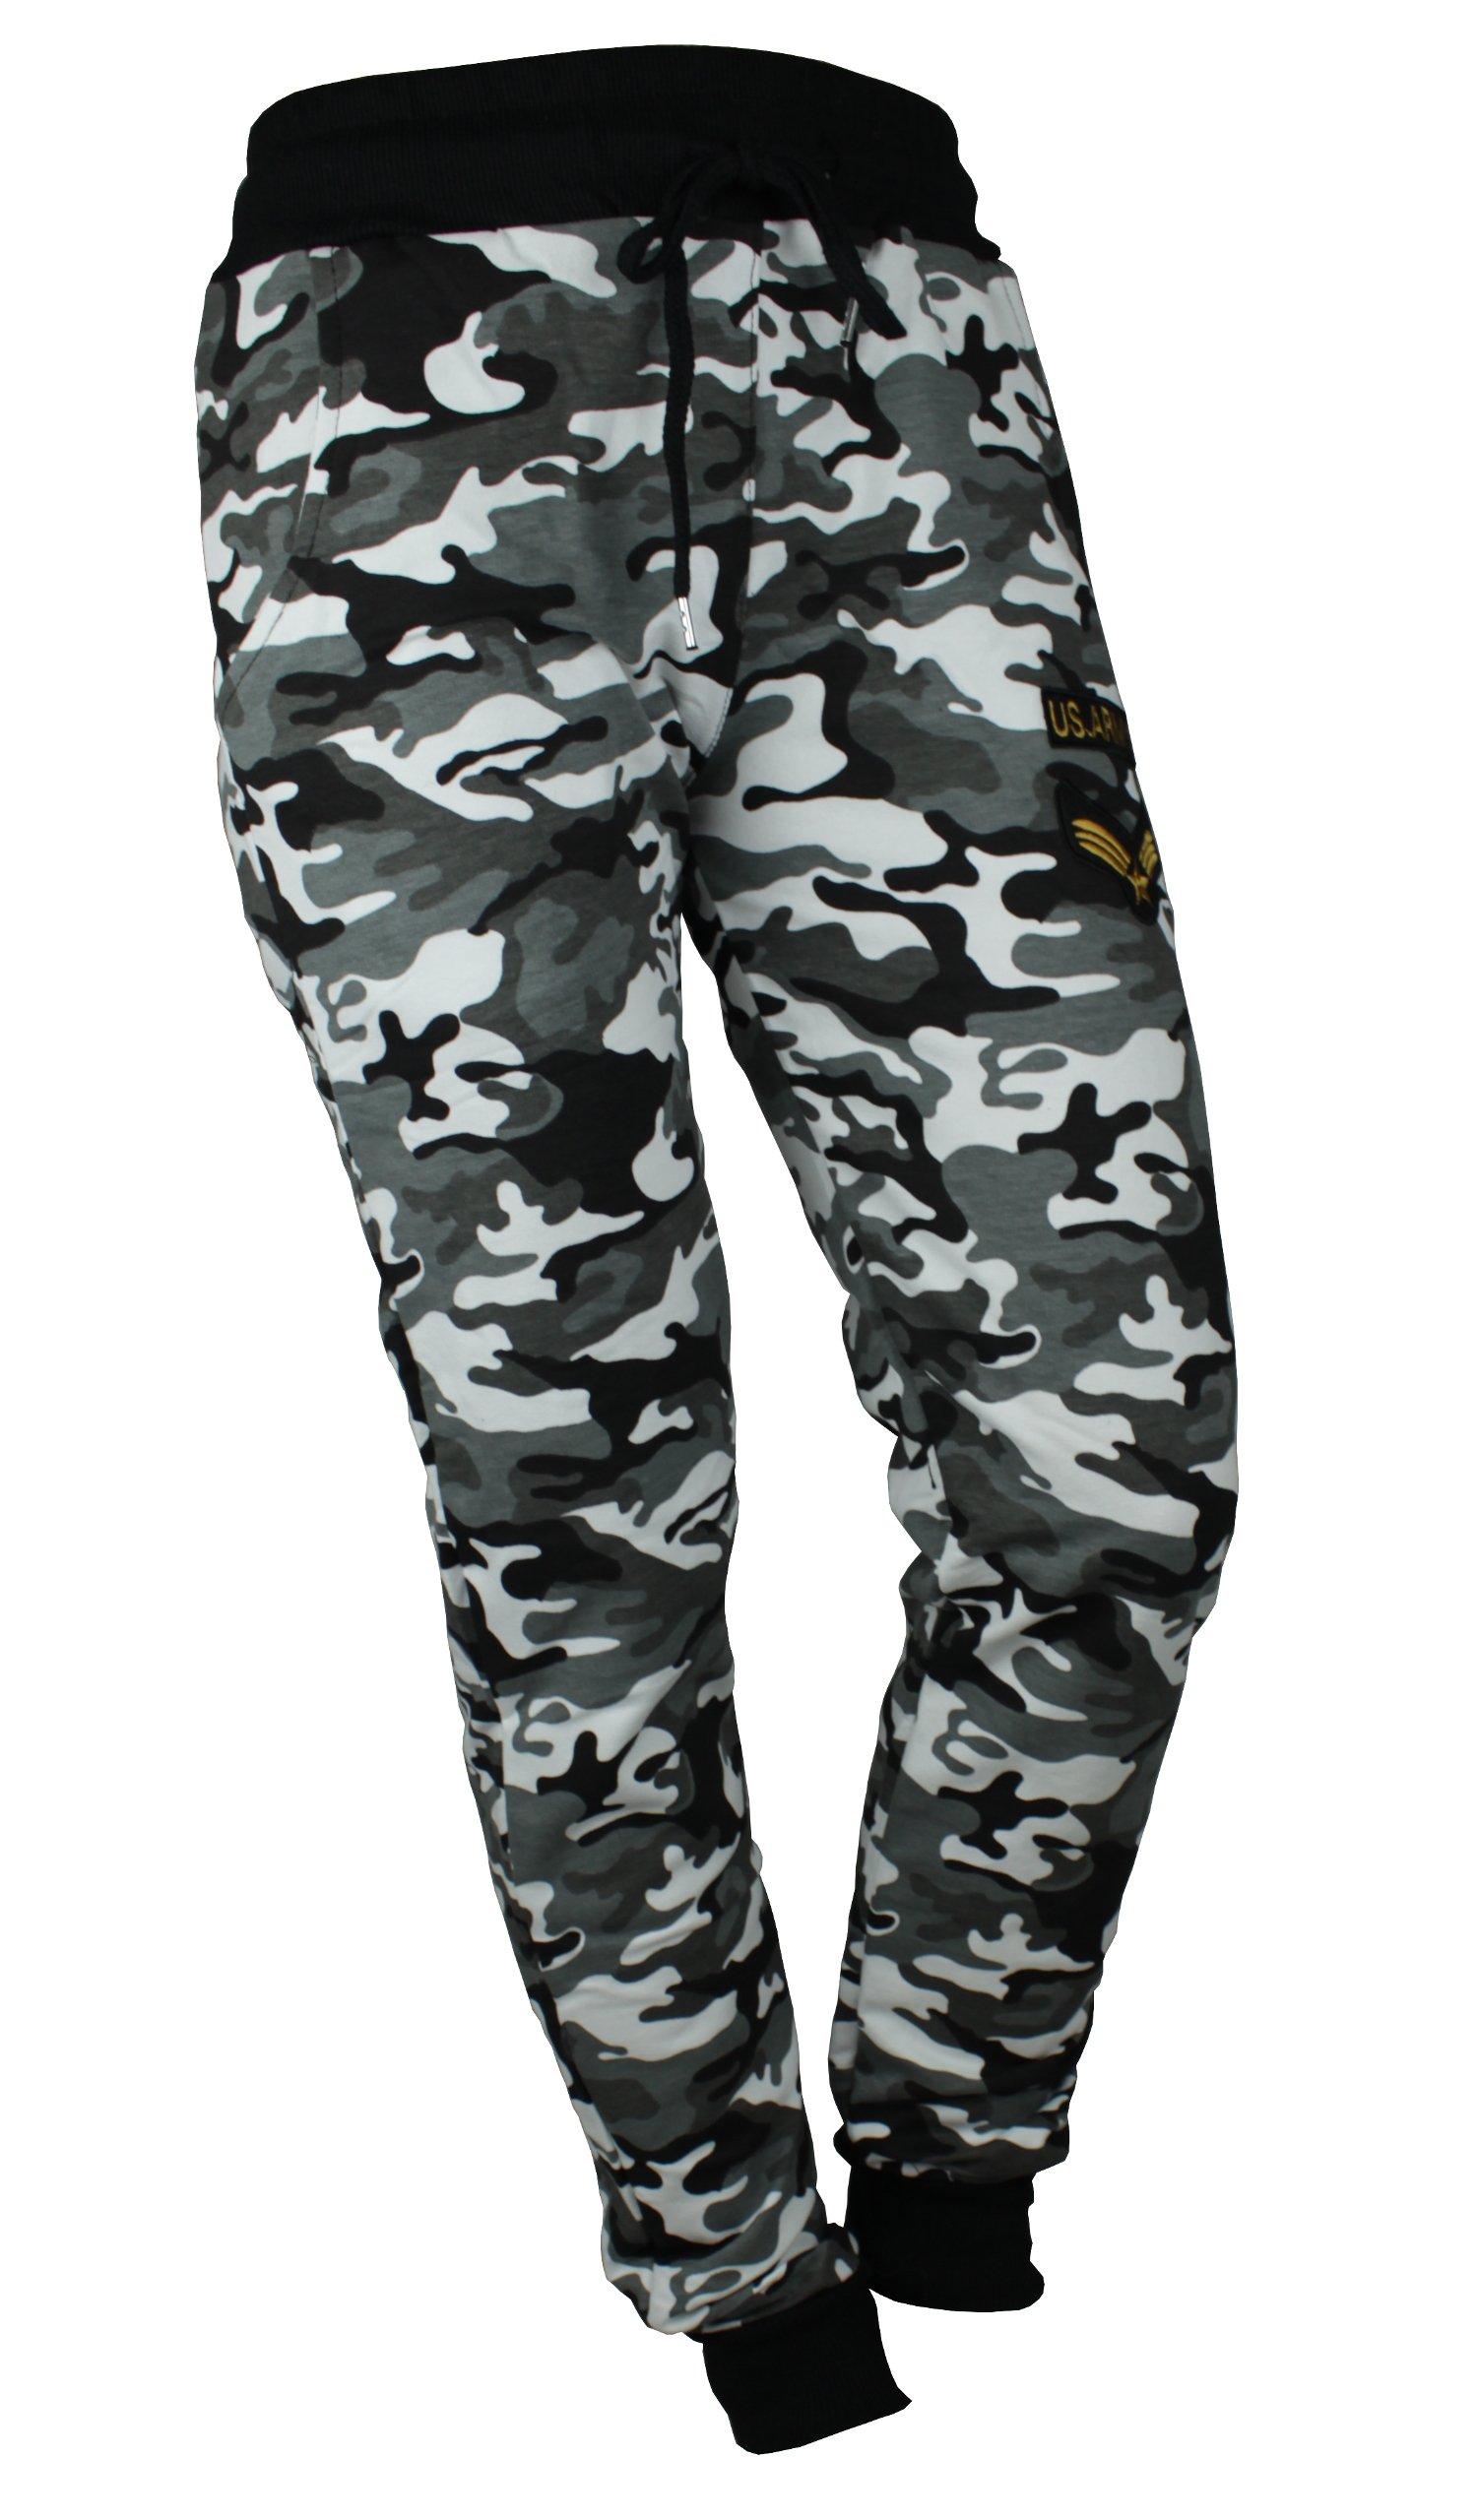 c58a00e5d767a6 Spodnie dresowe MORO bawełna MILITARY STYLE - S - 6704059236 ...